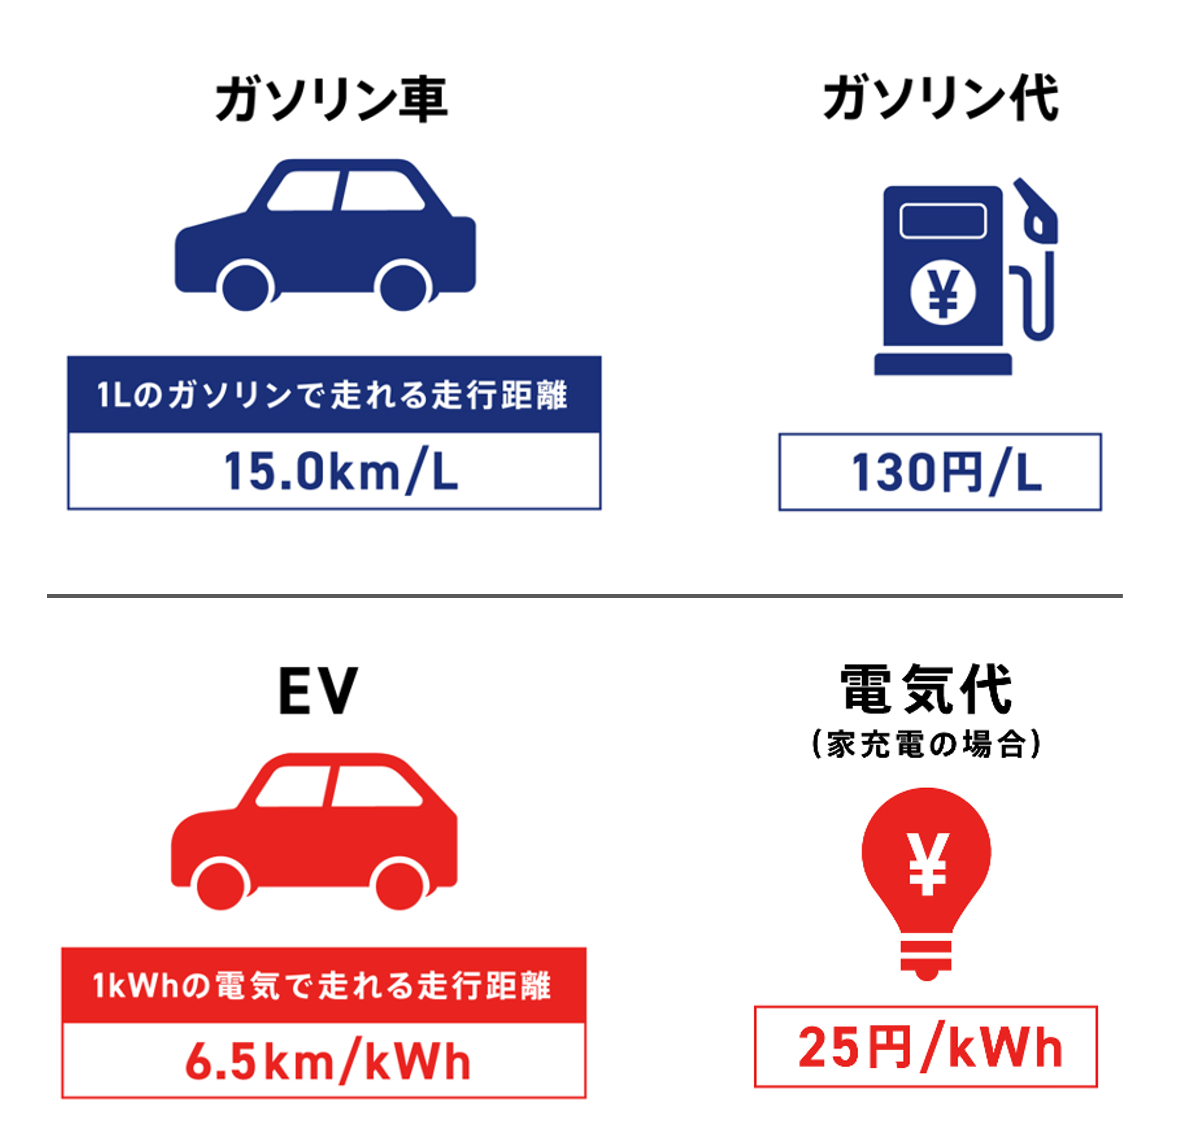 EVとガソリン車の比較